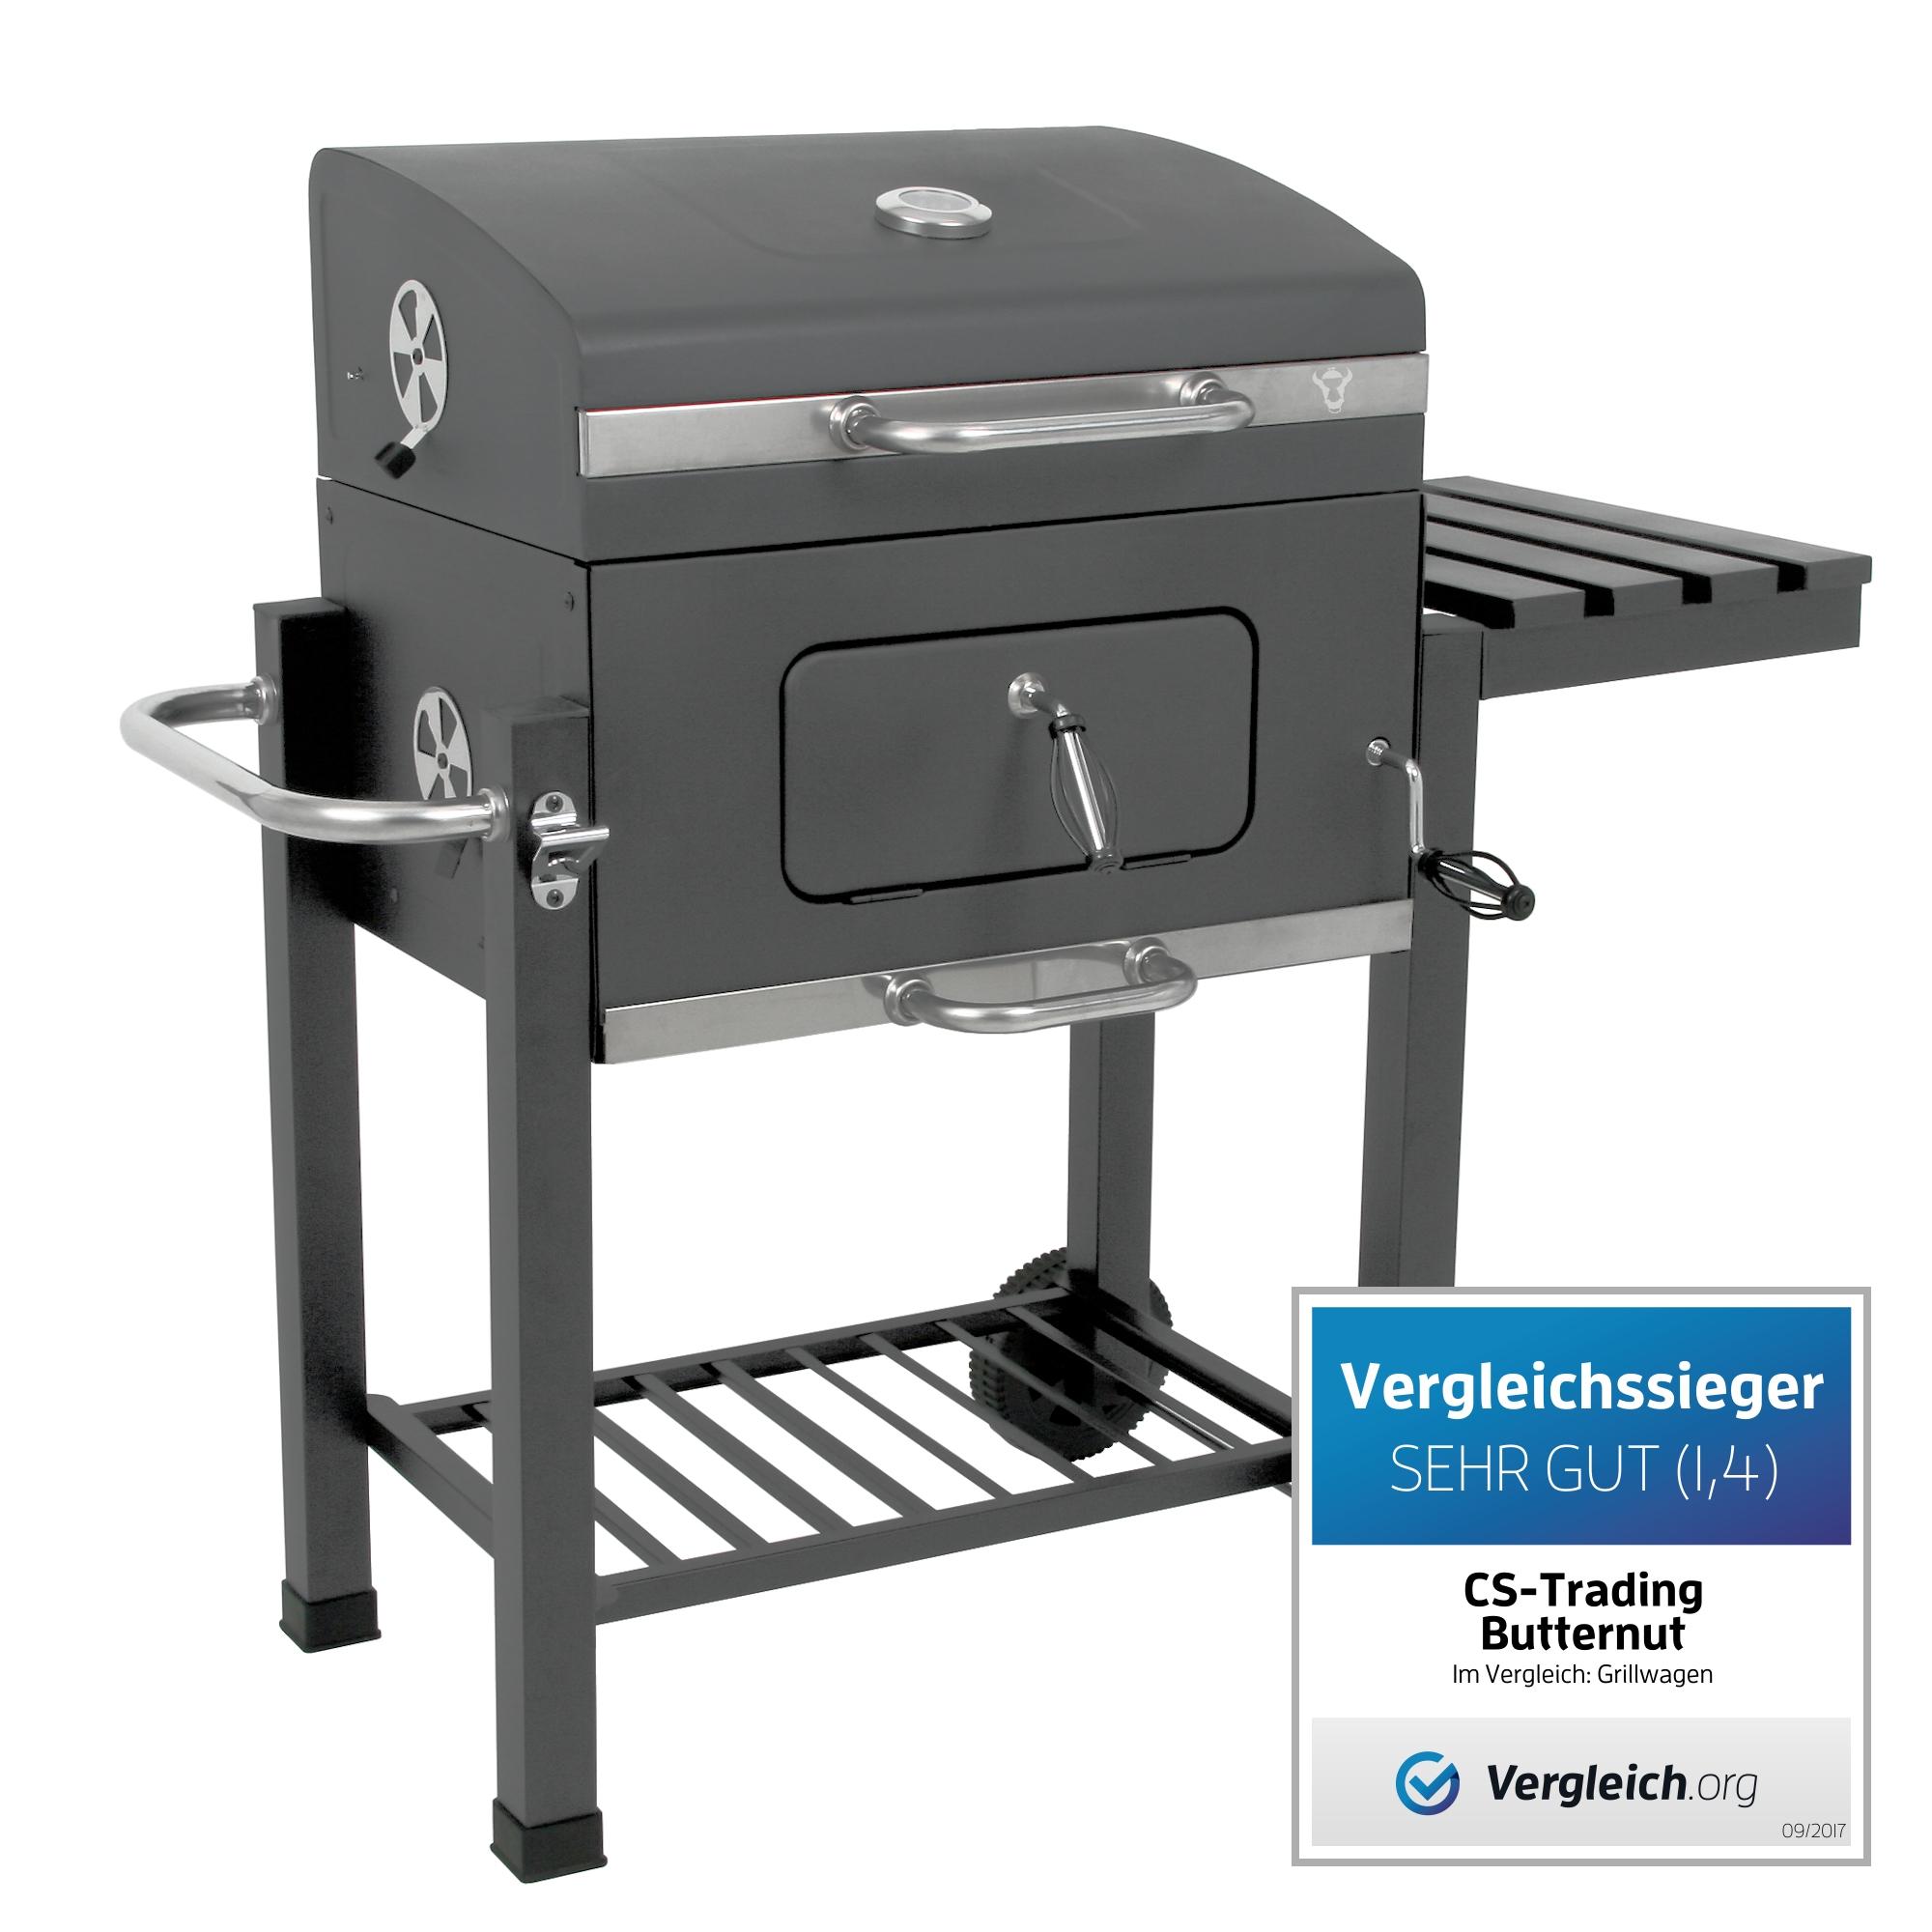 bbq toro holzkohle grillwagen butternut bbq smoker barbecue grill gartengrill ebay. Black Bedroom Furniture Sets. Home Design Ideas